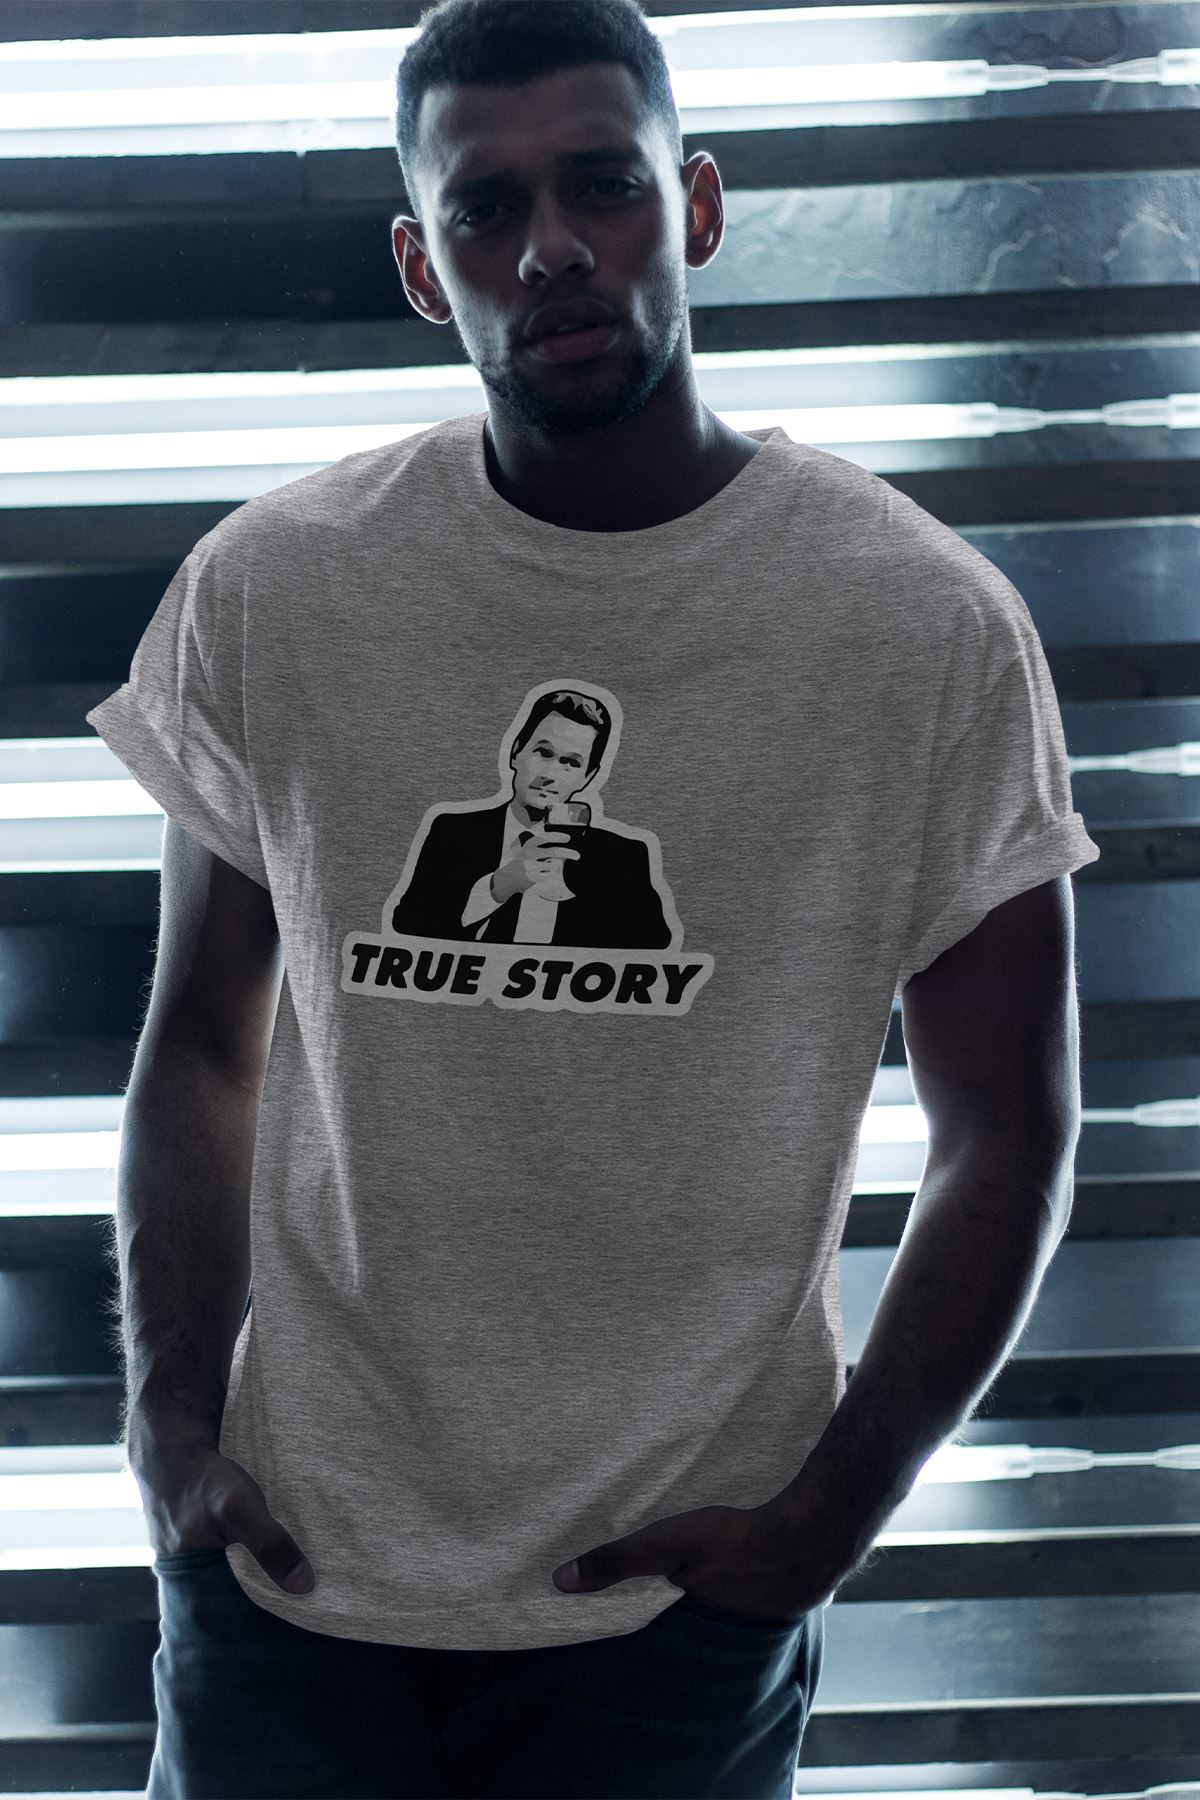 True Story Gri Erkek Oversize Tshirt - Tişört